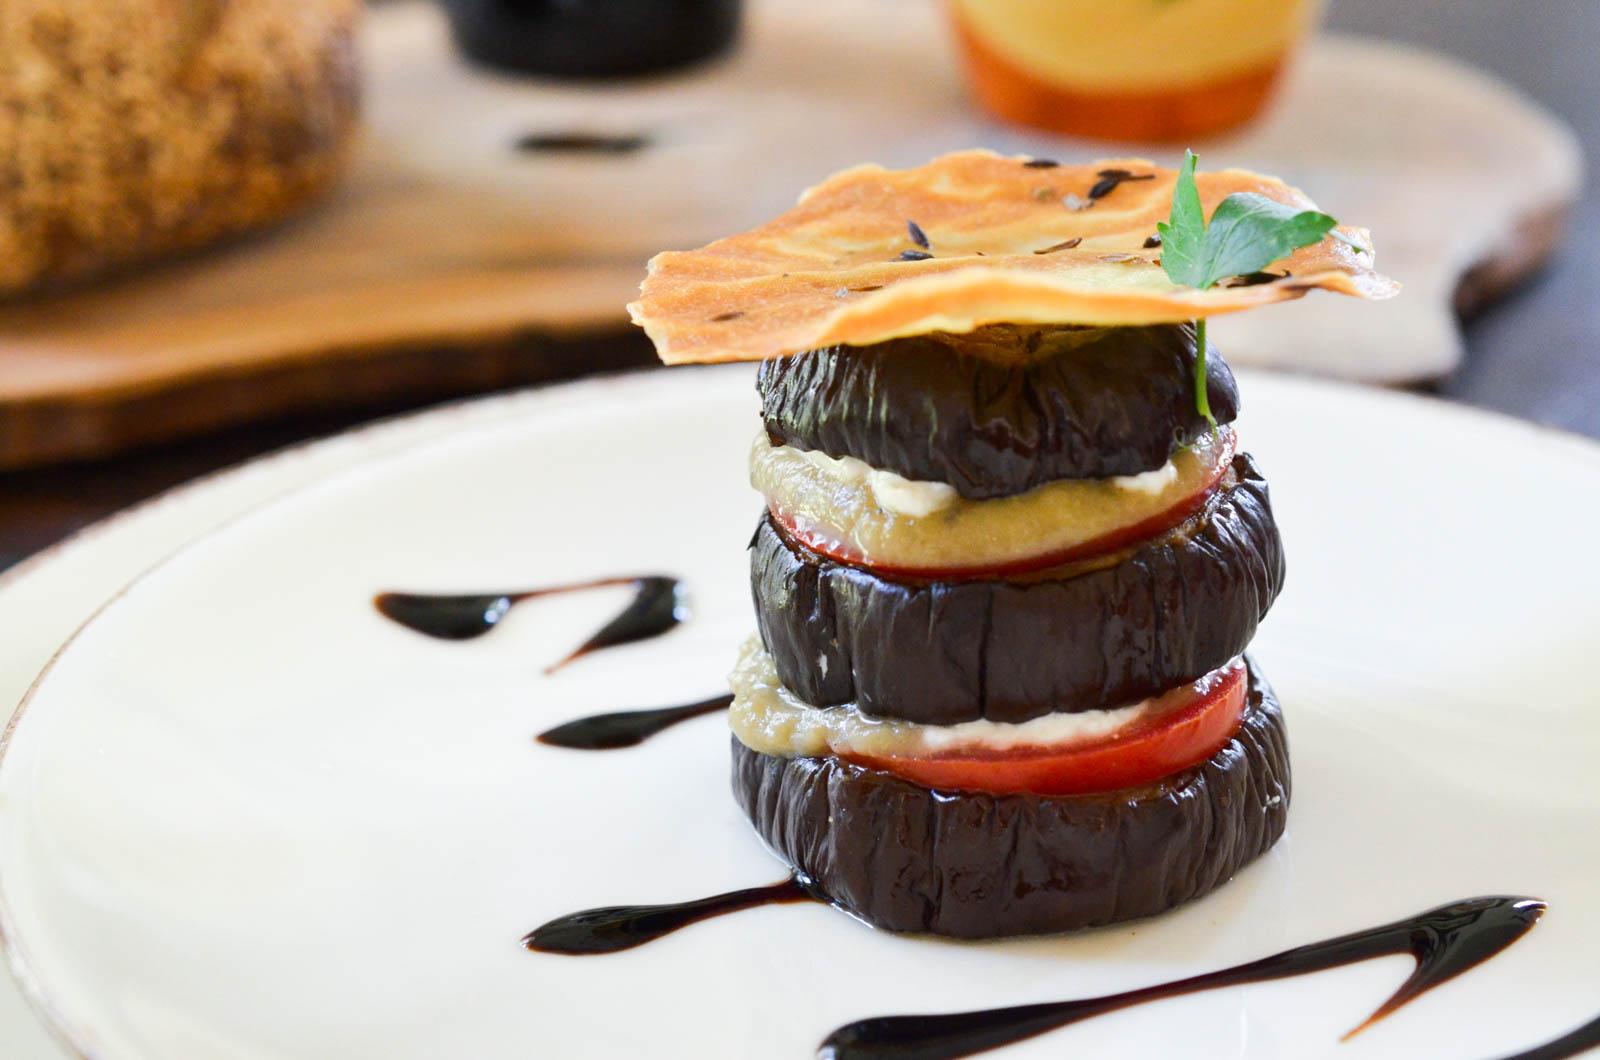 Millefeuille Aubergines Burrata Caviar Tuiles (7 Sur 7)